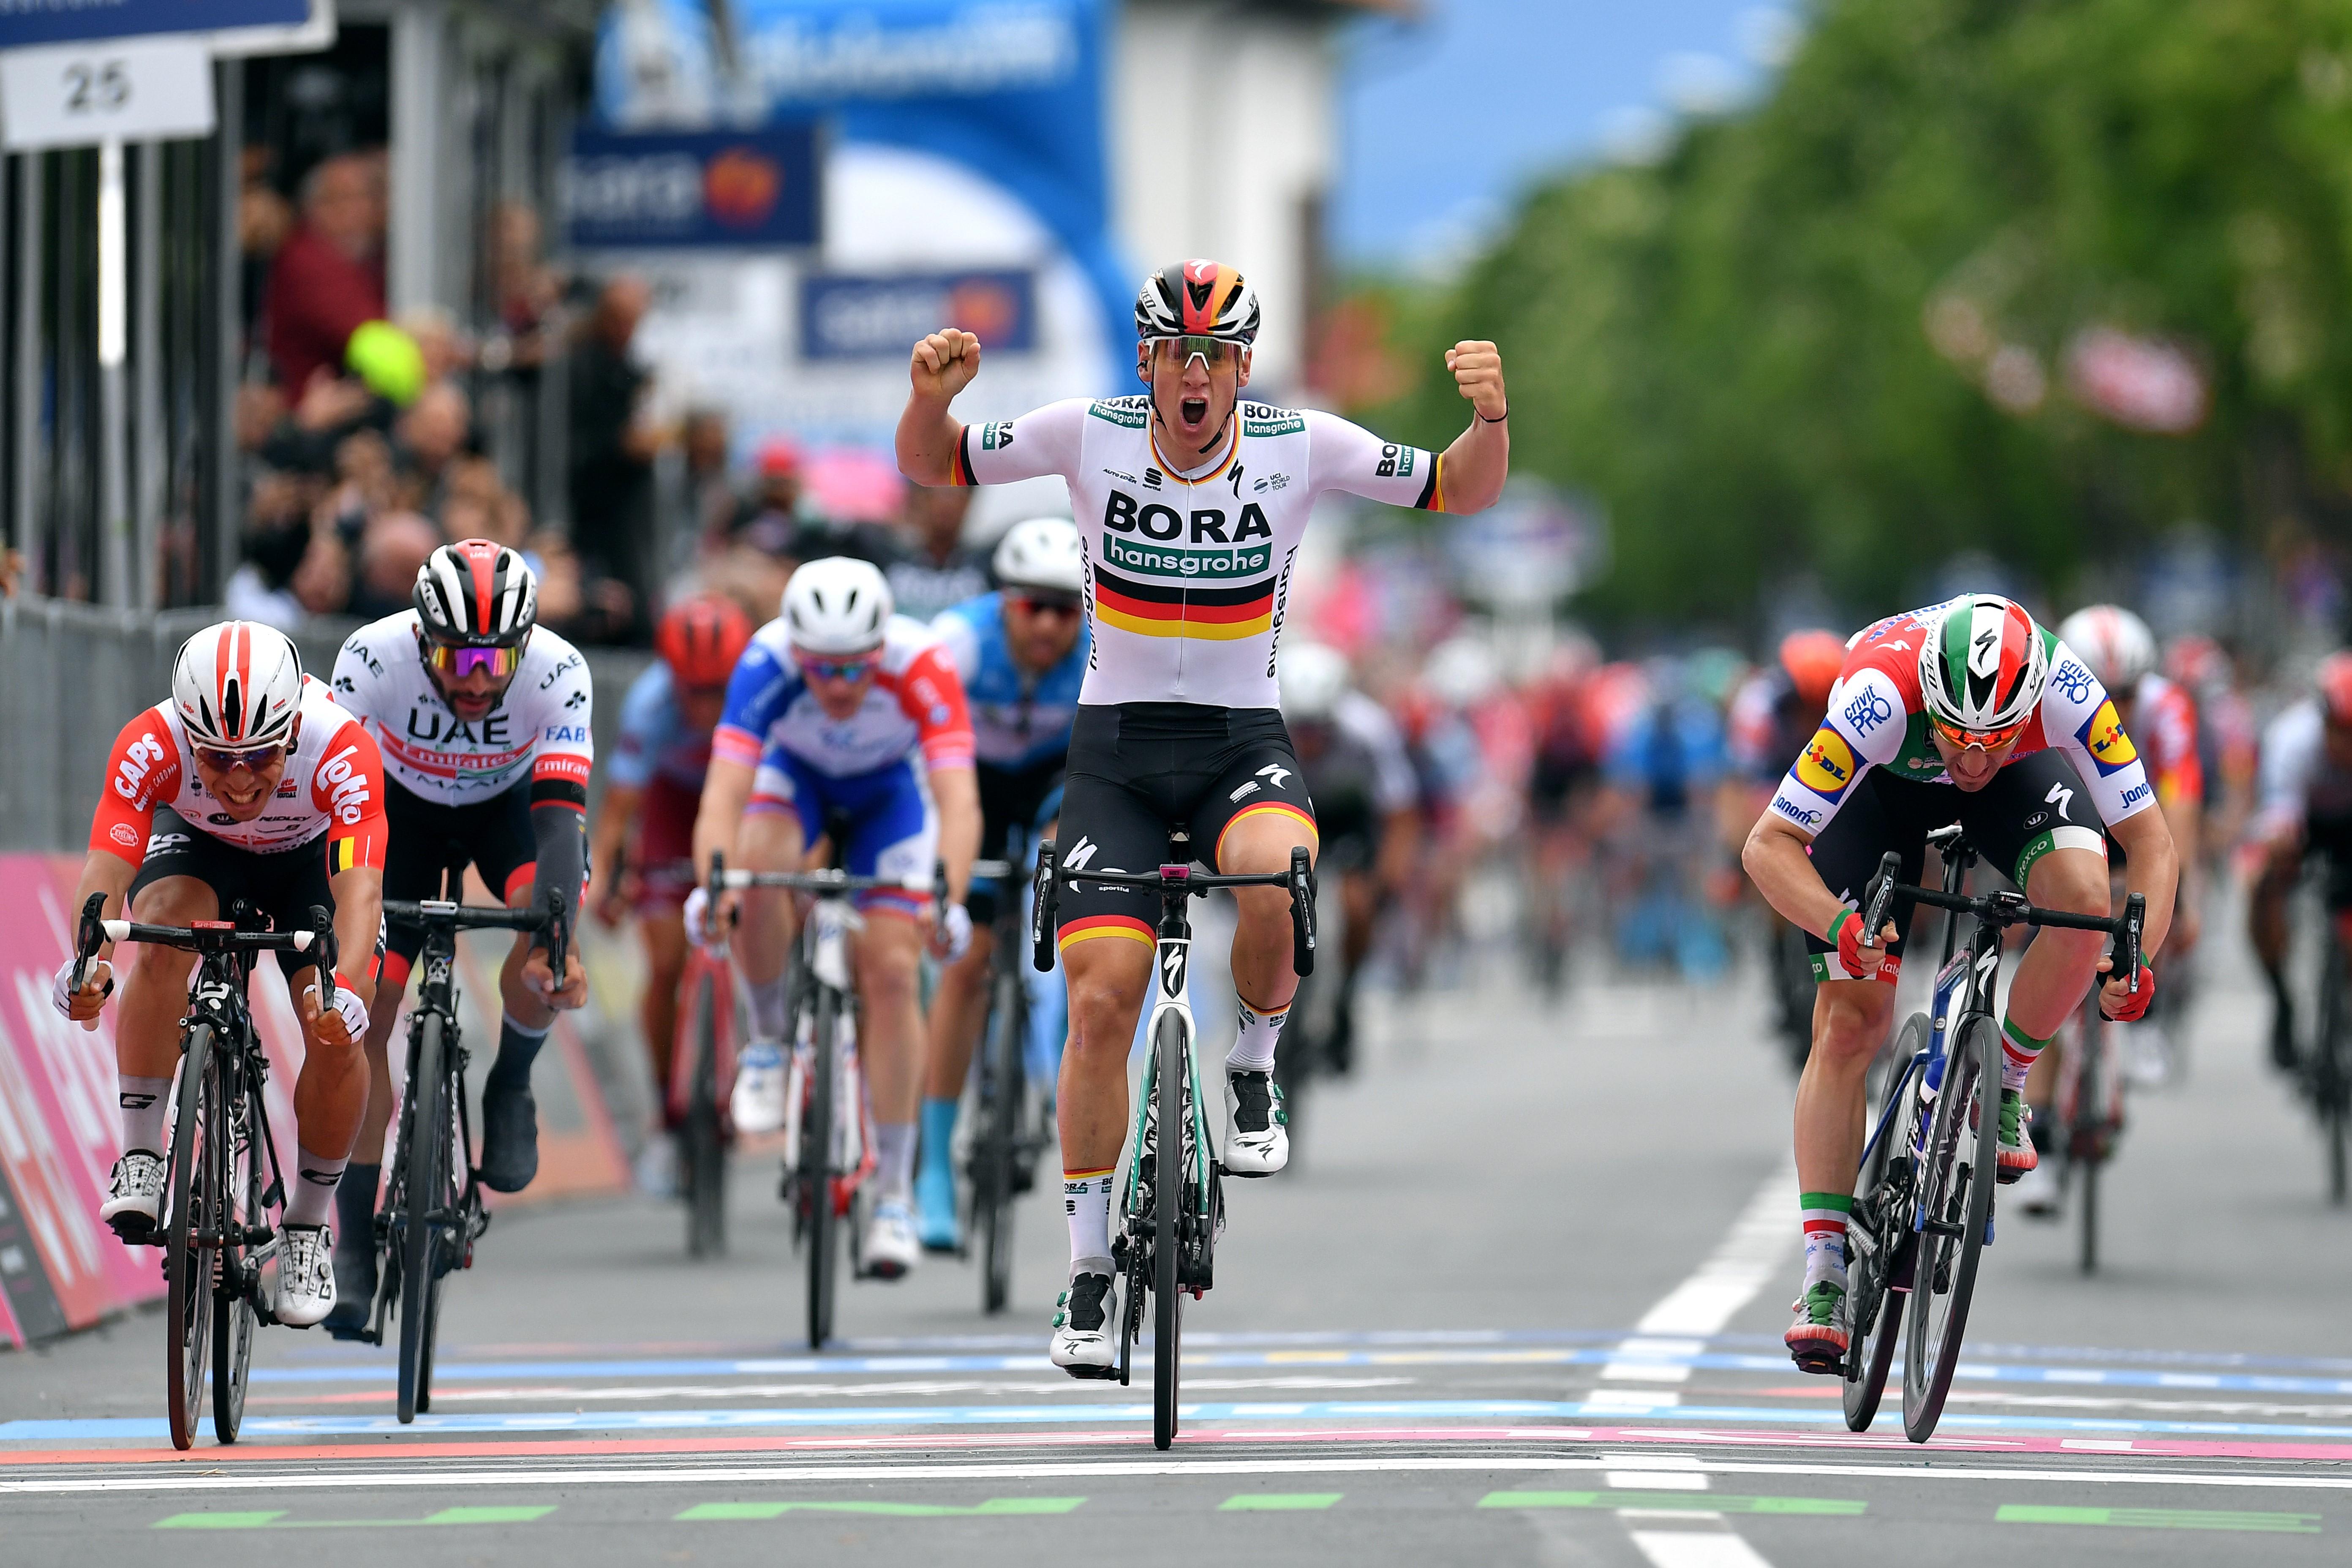 Bora Hansgrohe'li Pascal Ackermann, Giro 2019'un ikinci etabında galibiyete ulaştı.